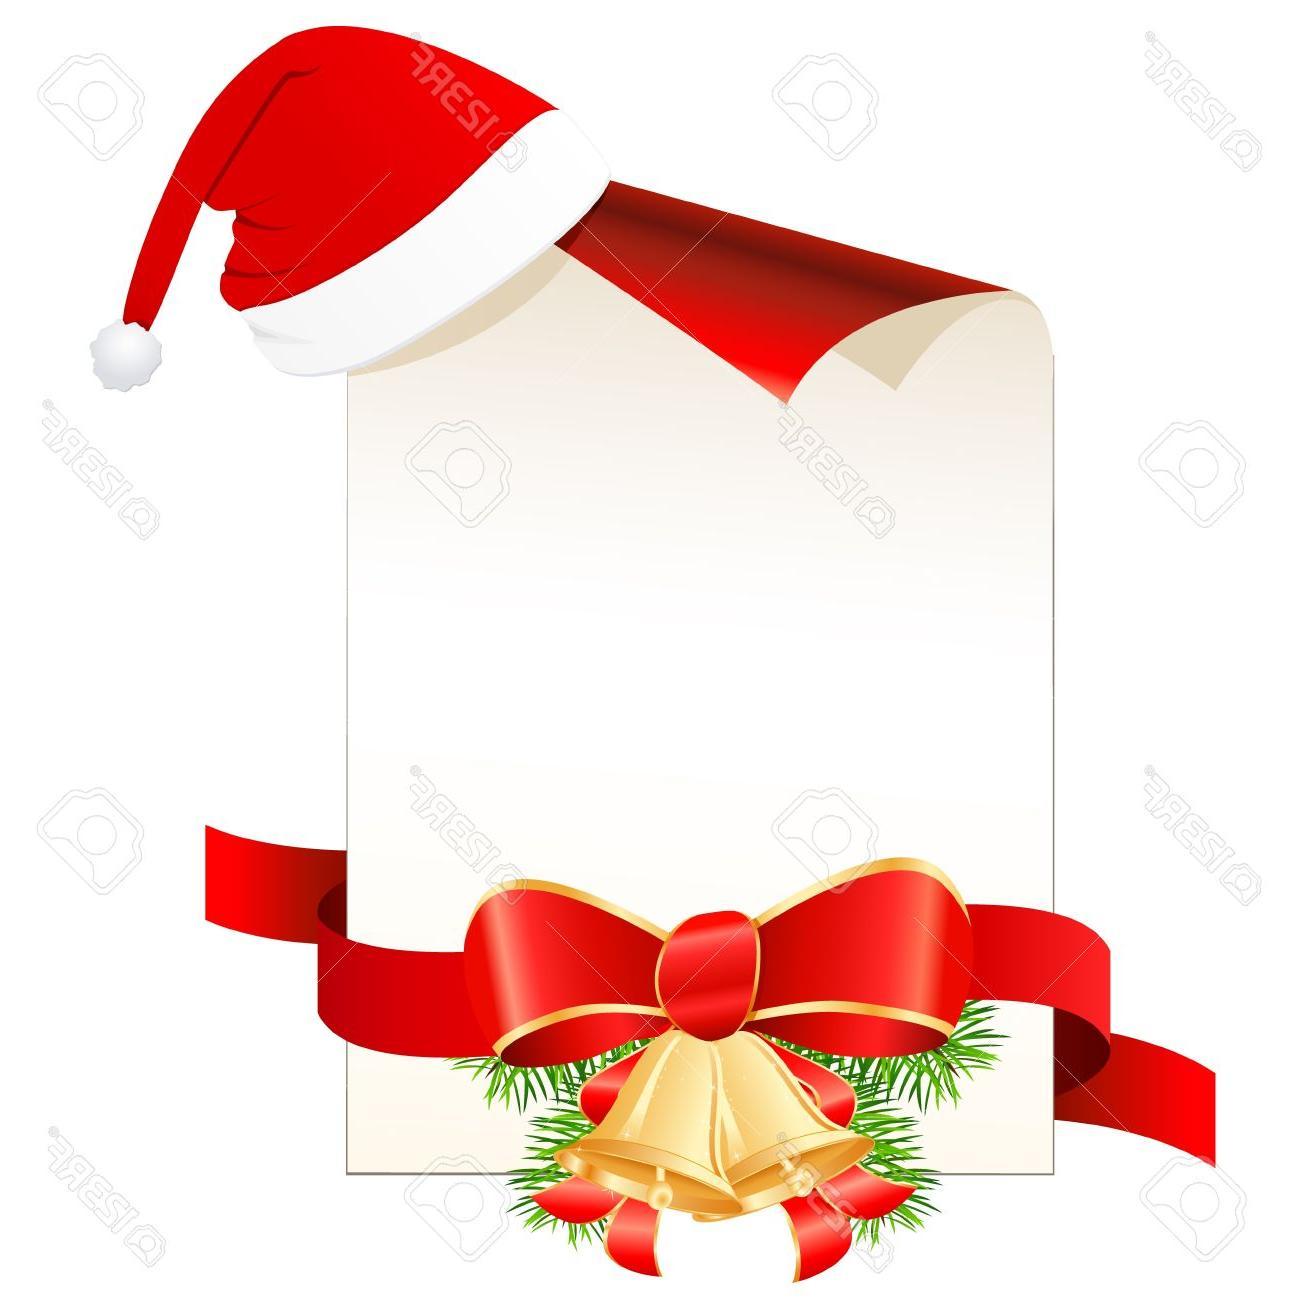 Unique christmas clipart graphic download Unique Christmas List Clip Art Vector Image » Free Vector ... graphic download